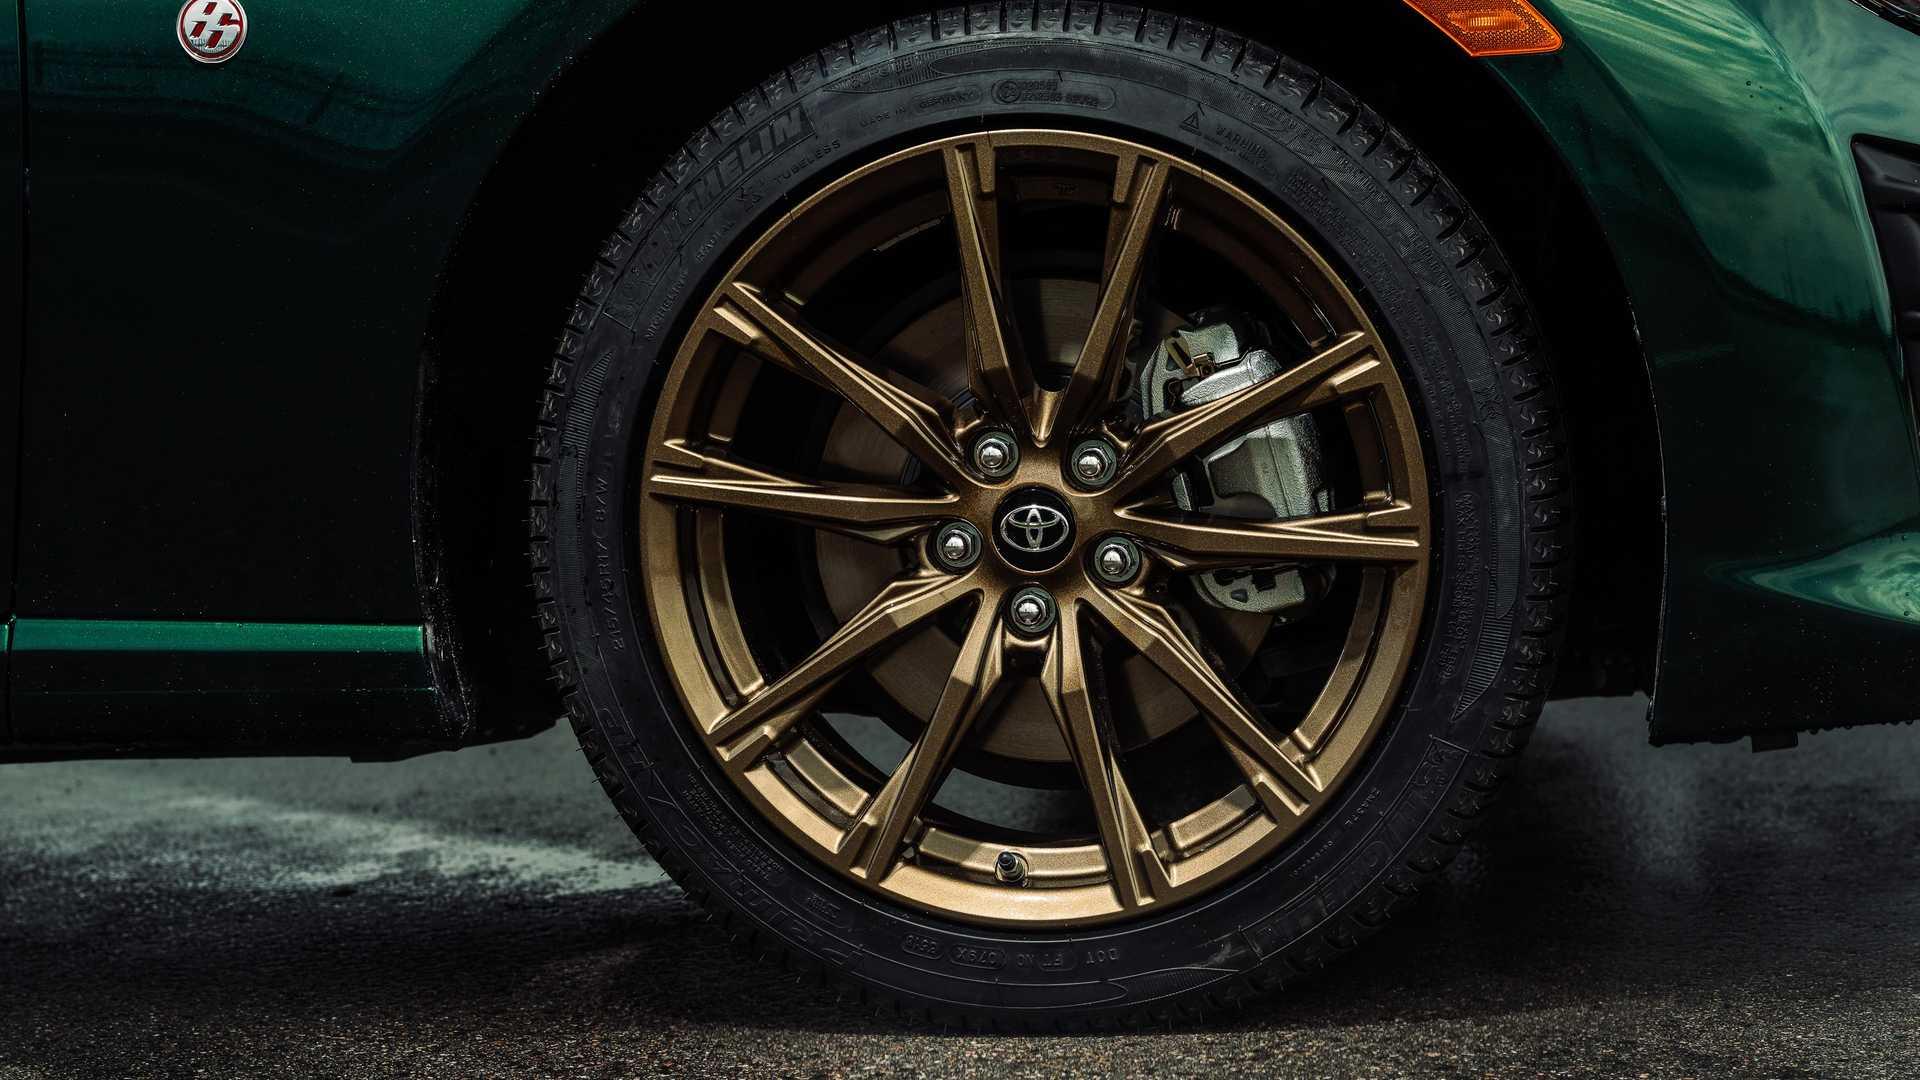 2020 Toyota 86 Hakone Edition Wheel Wallpapers (6)